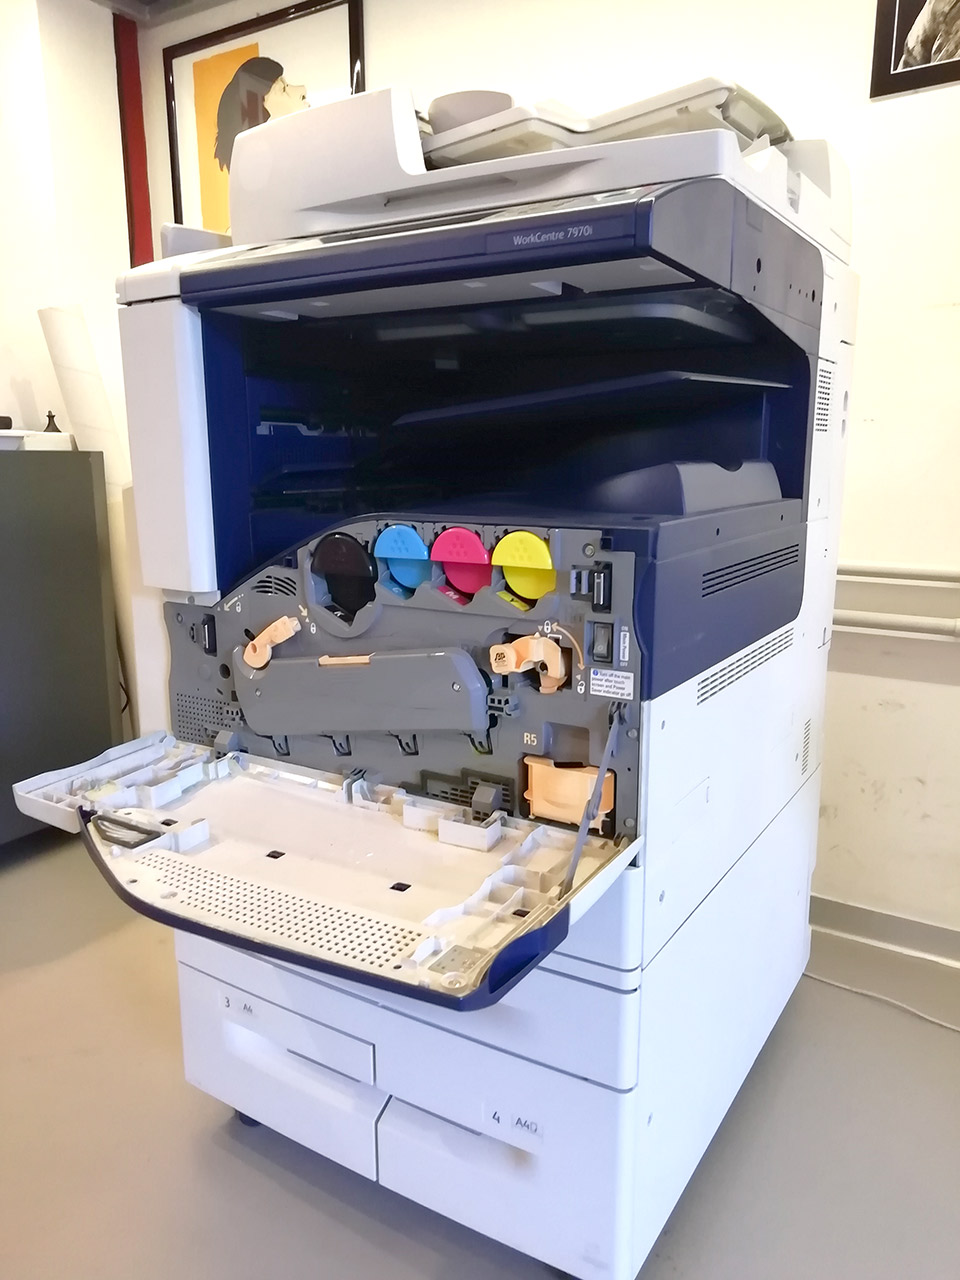 Xerox Workcentre 7970 - Vista interno